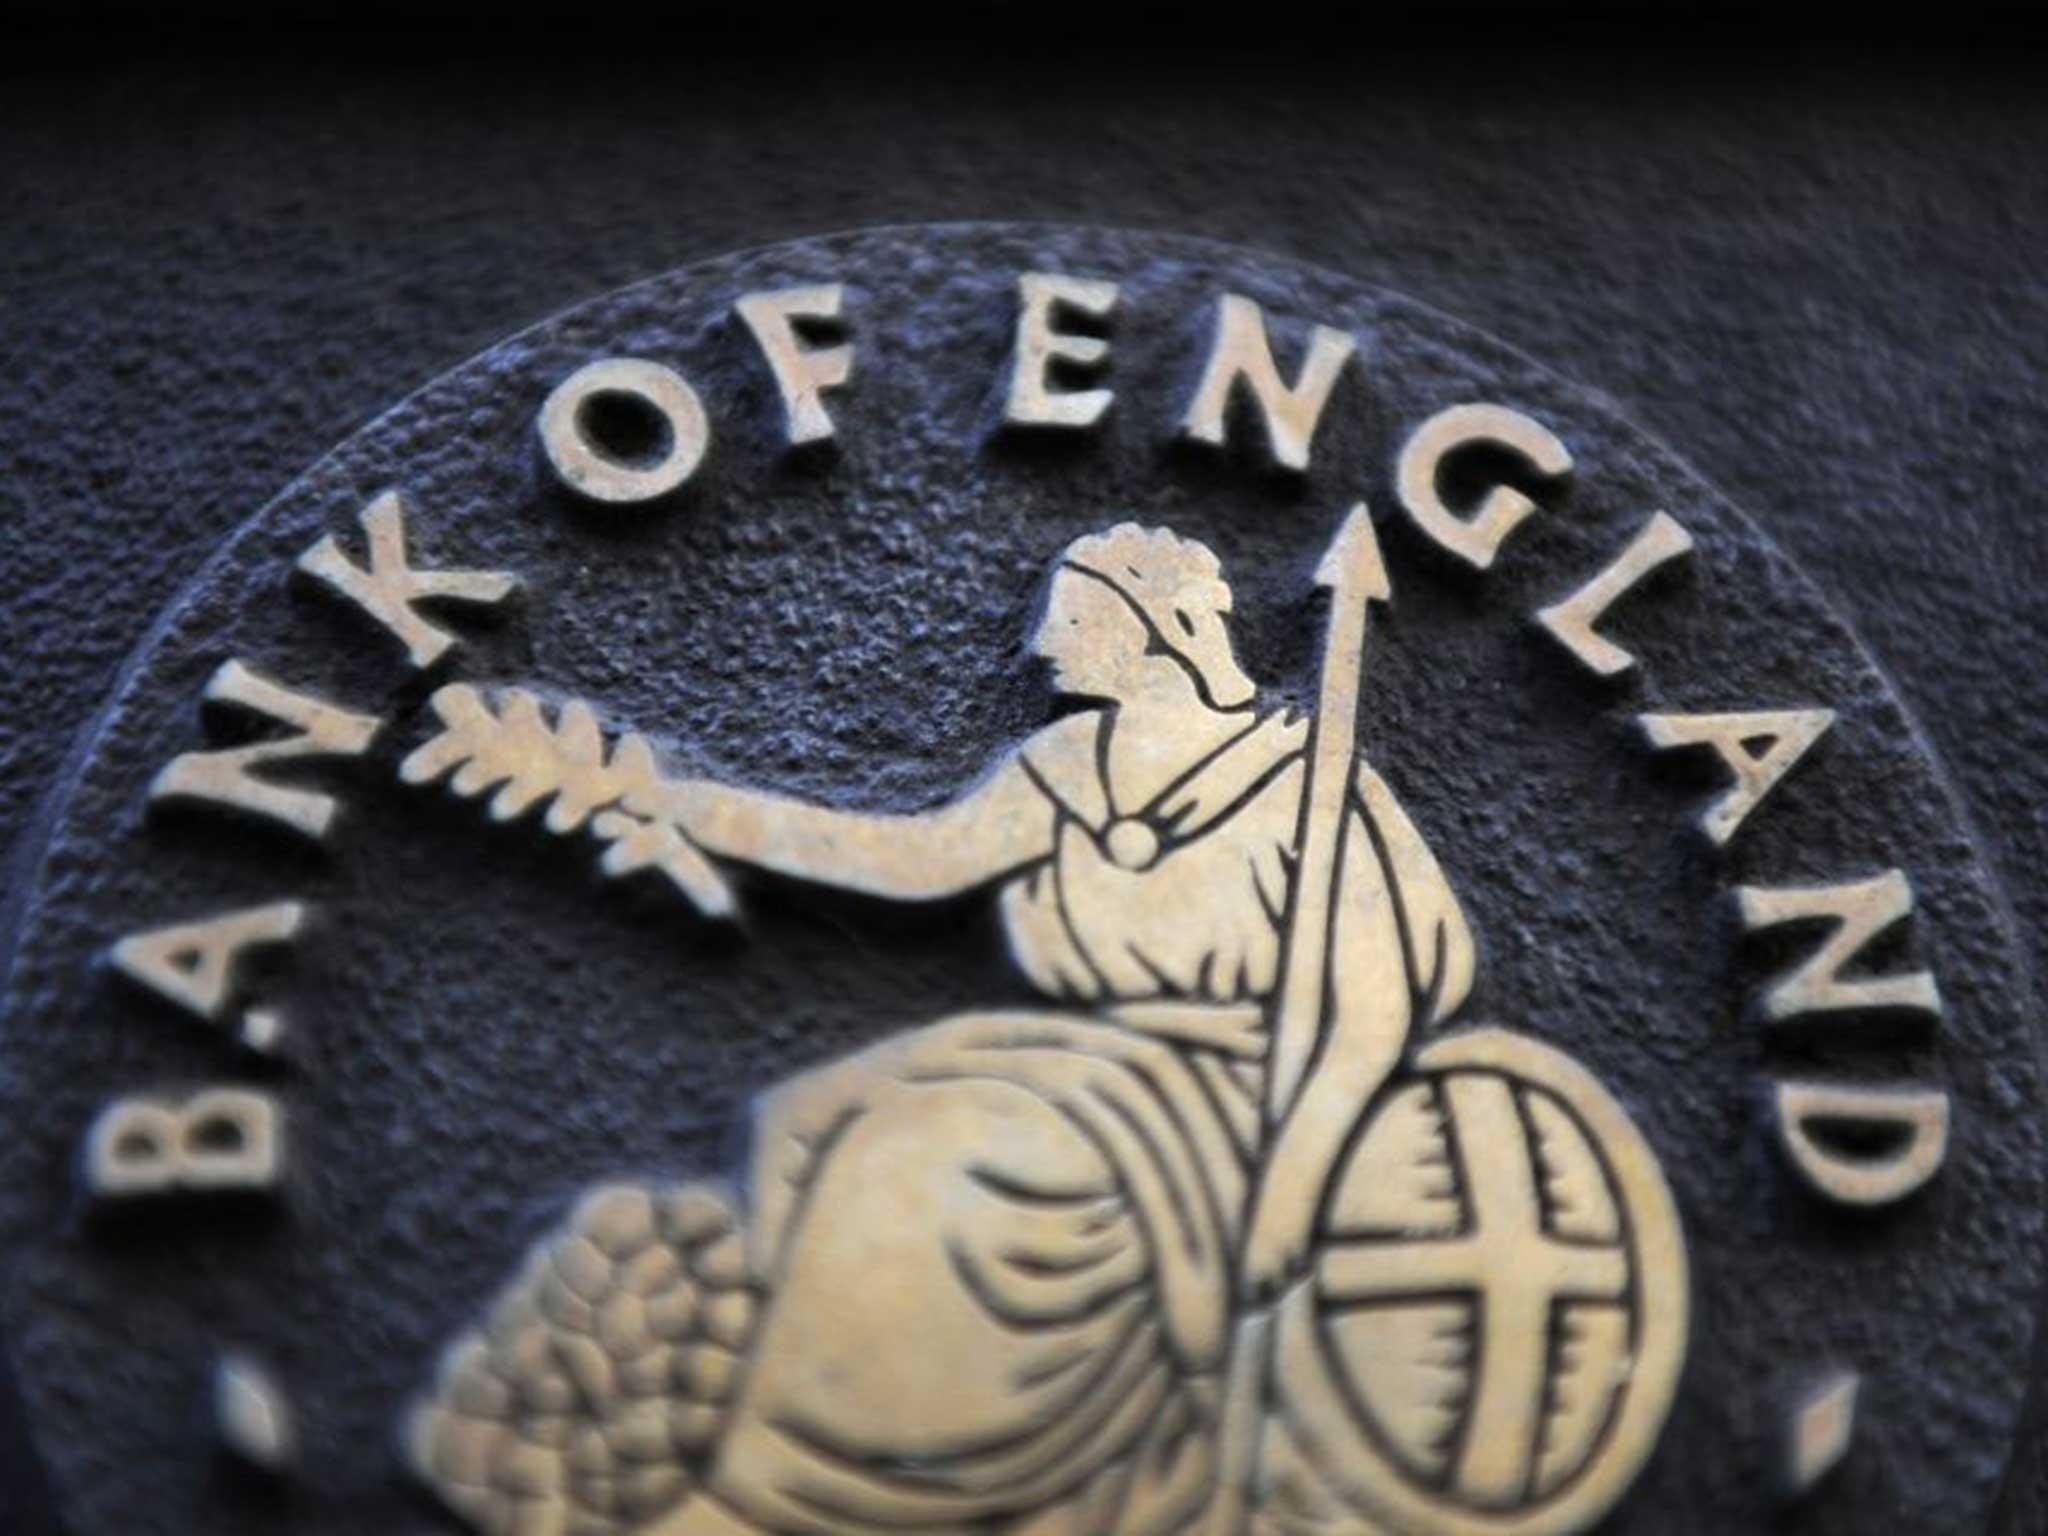 Bank of England Imc